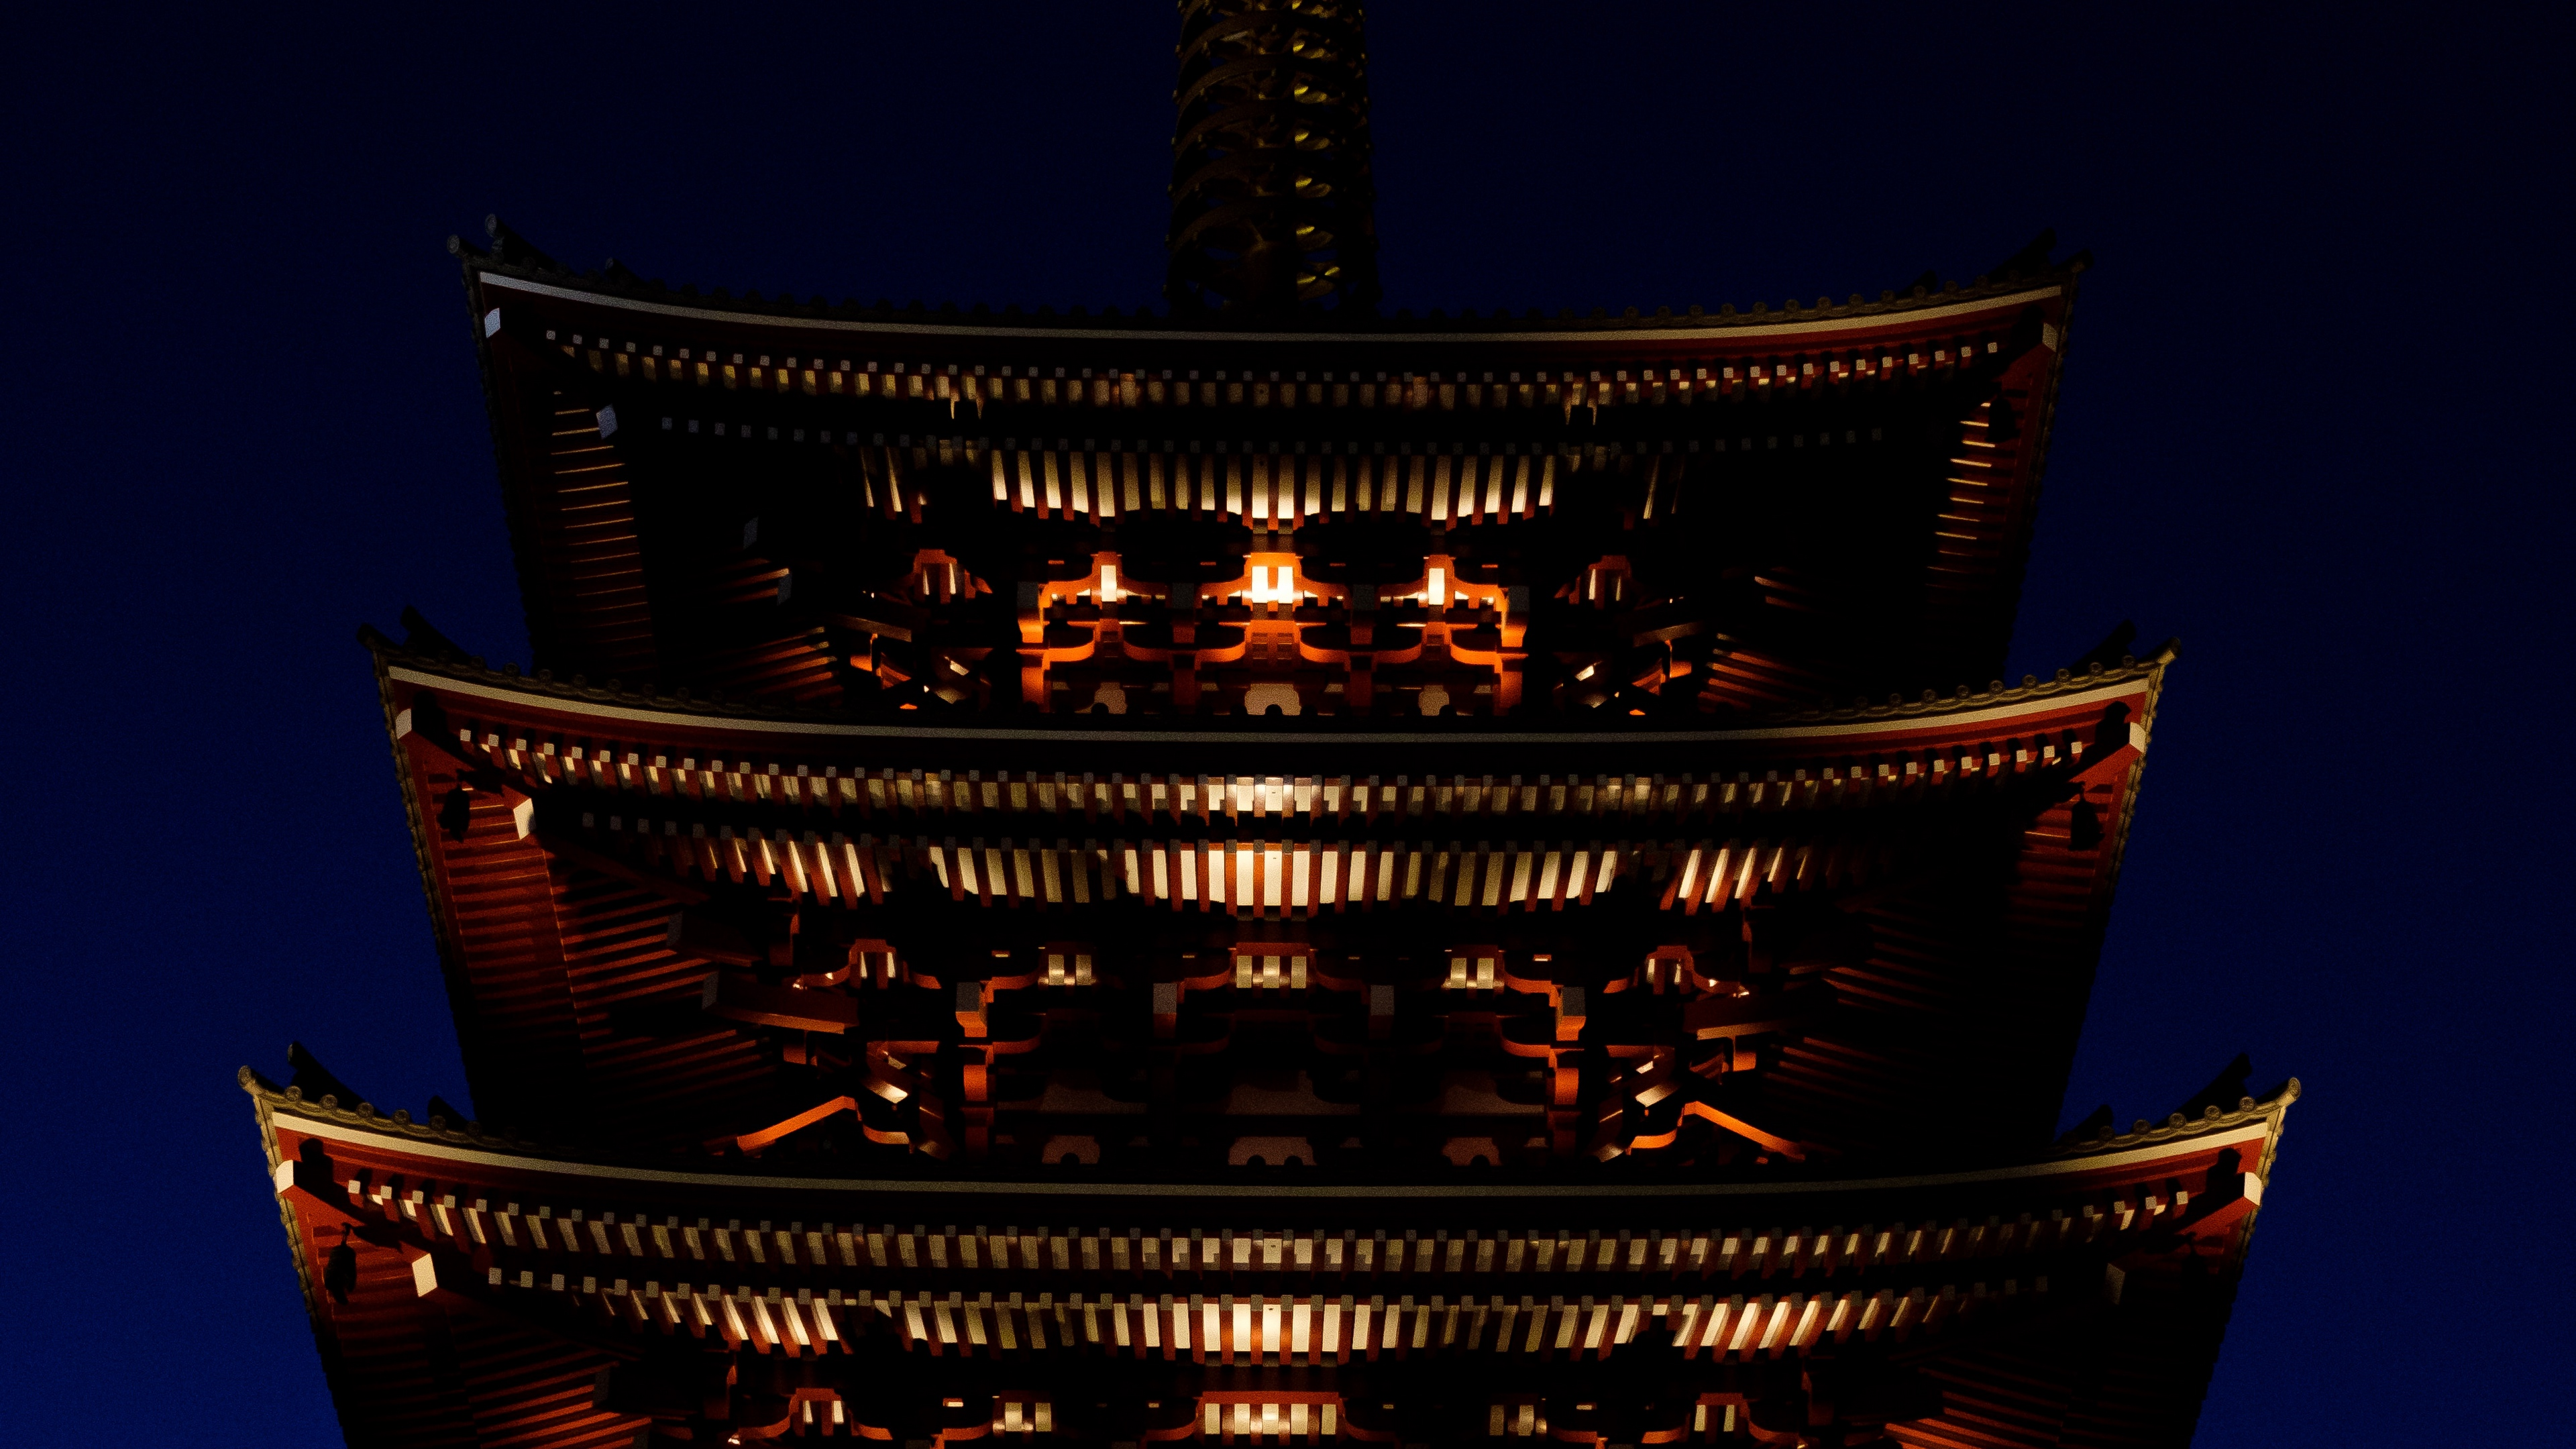 pagoda roof building night lighting 4k 1538066616 - pagoda, roof, building, night, lighting 4k - roof, pagoda, Building